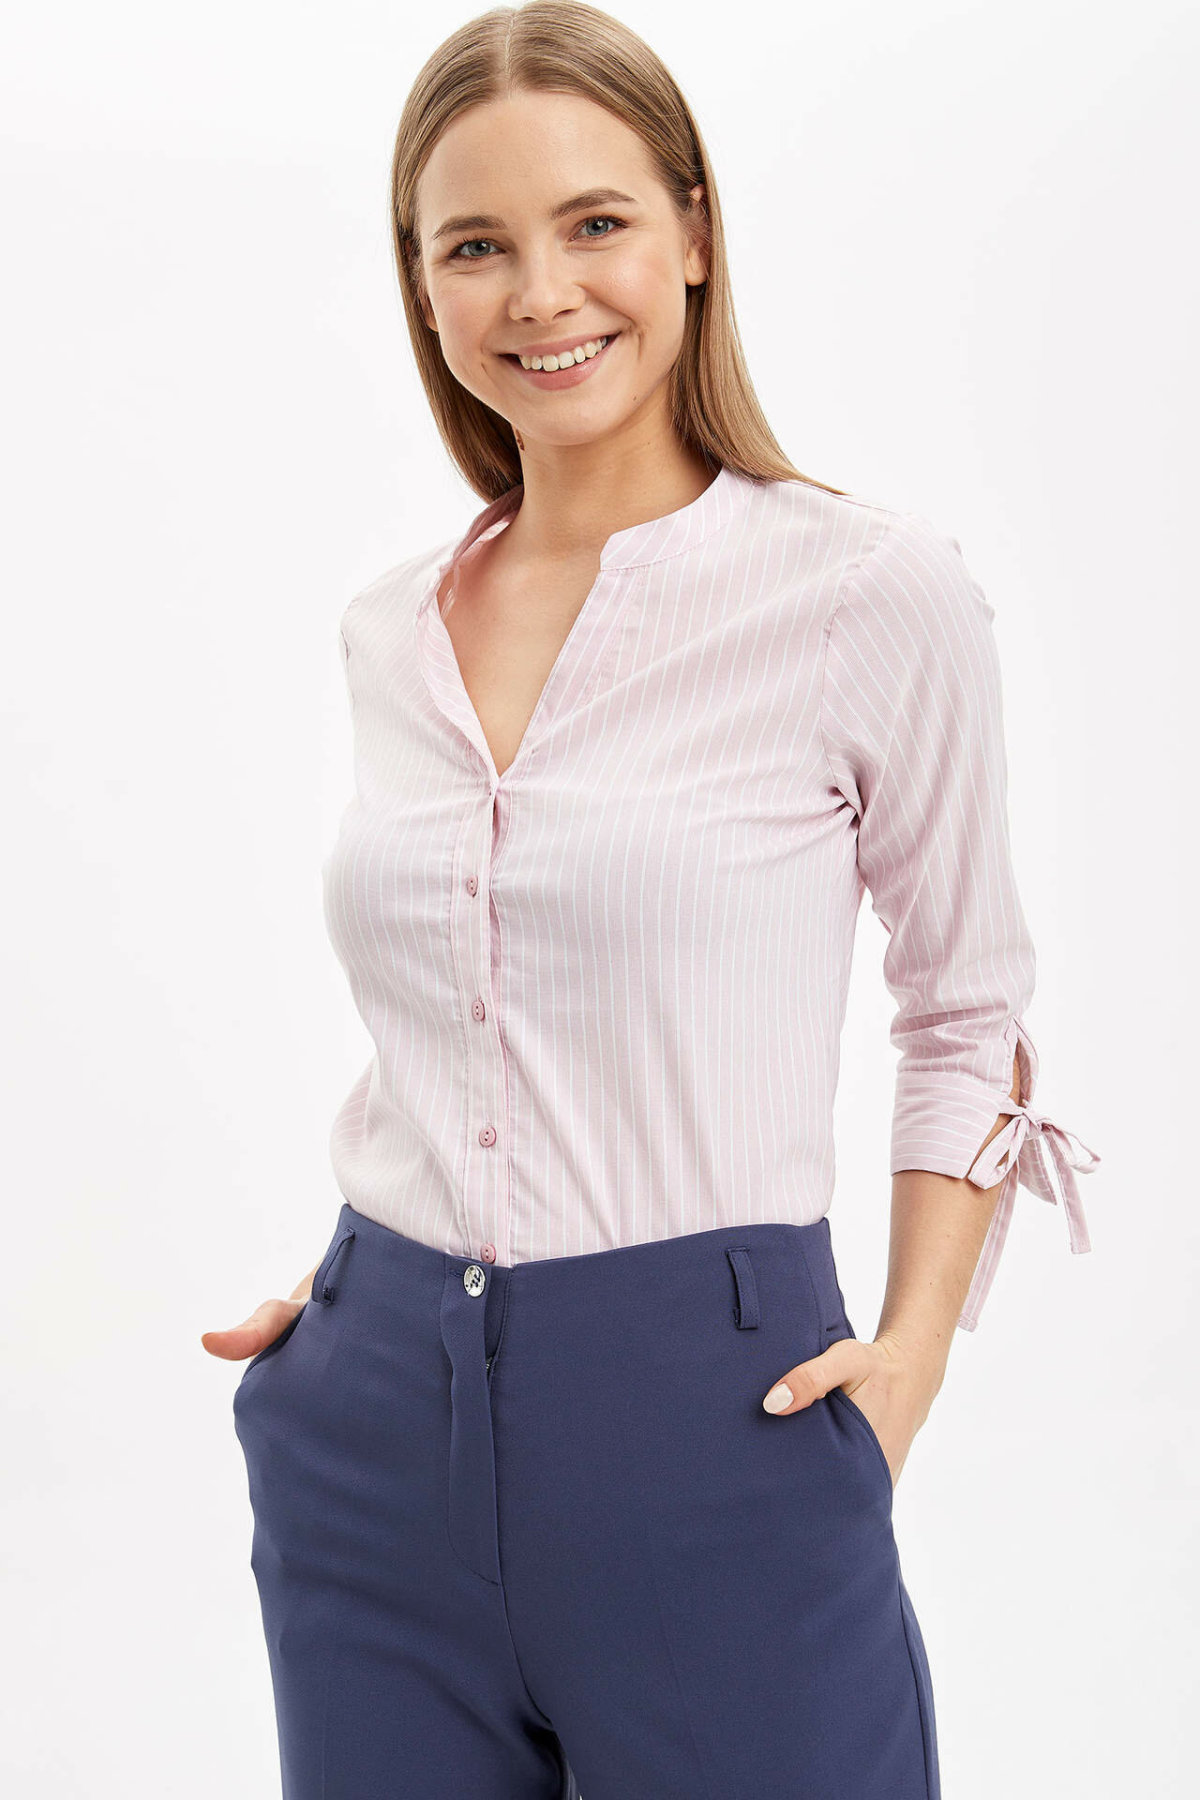 DeFacto Spring Woman Basic Color Shirts Women Mid-Sleeve Floral Prints Shirt Women Pink Blue Grey Shirts-I5280AZ20SP